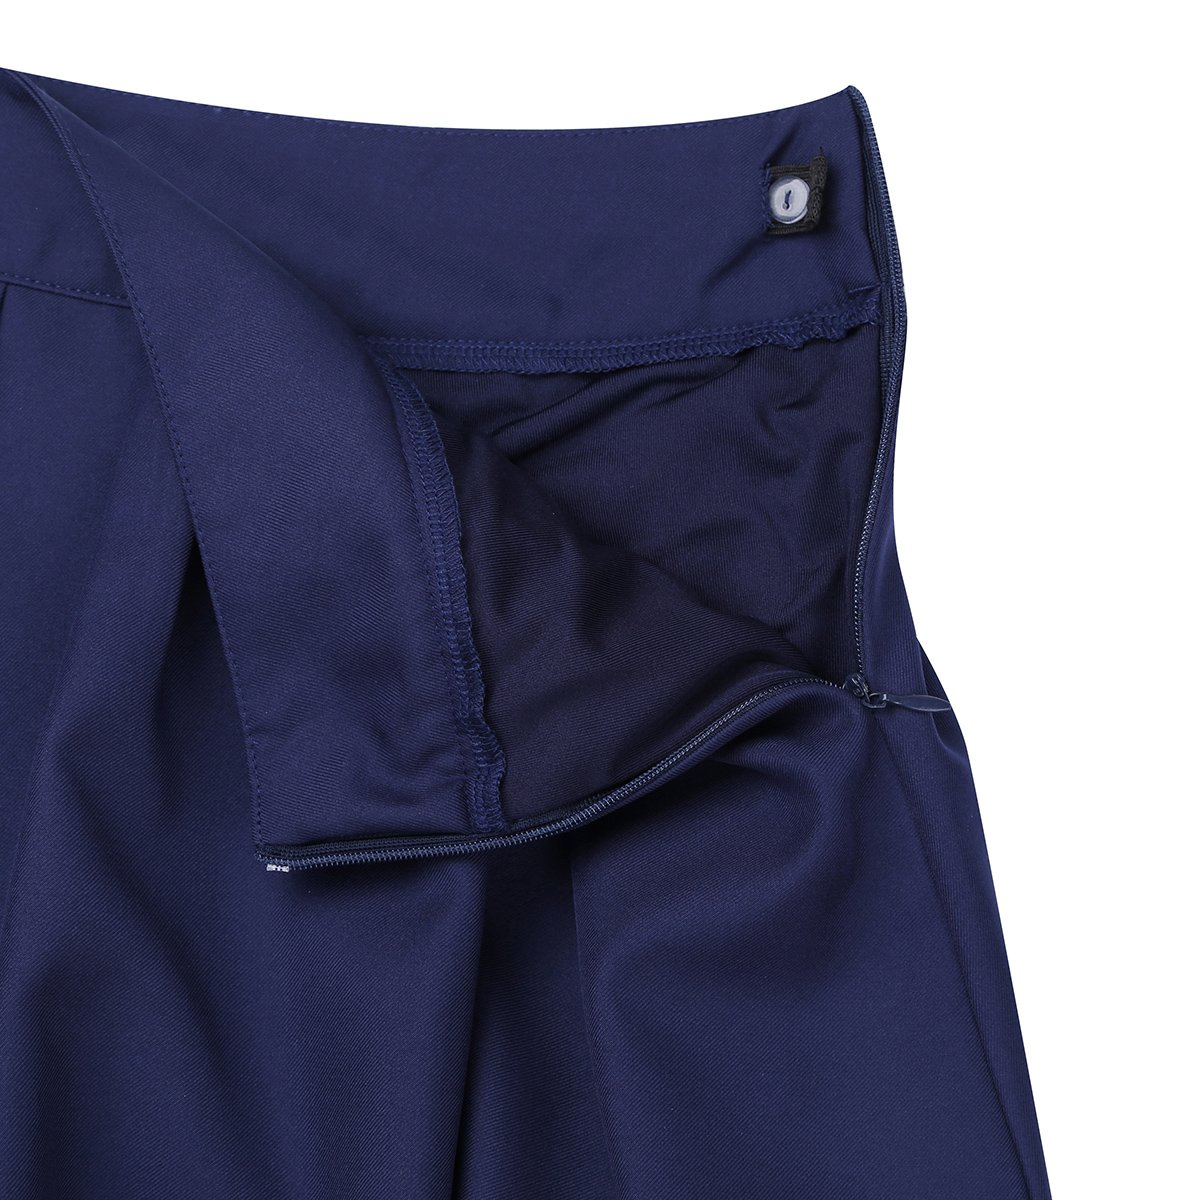 YiZYiF Kids Girls Elastic Soft Plain Uniform Pleated Skirt with Hidden Shorts Schoolwear